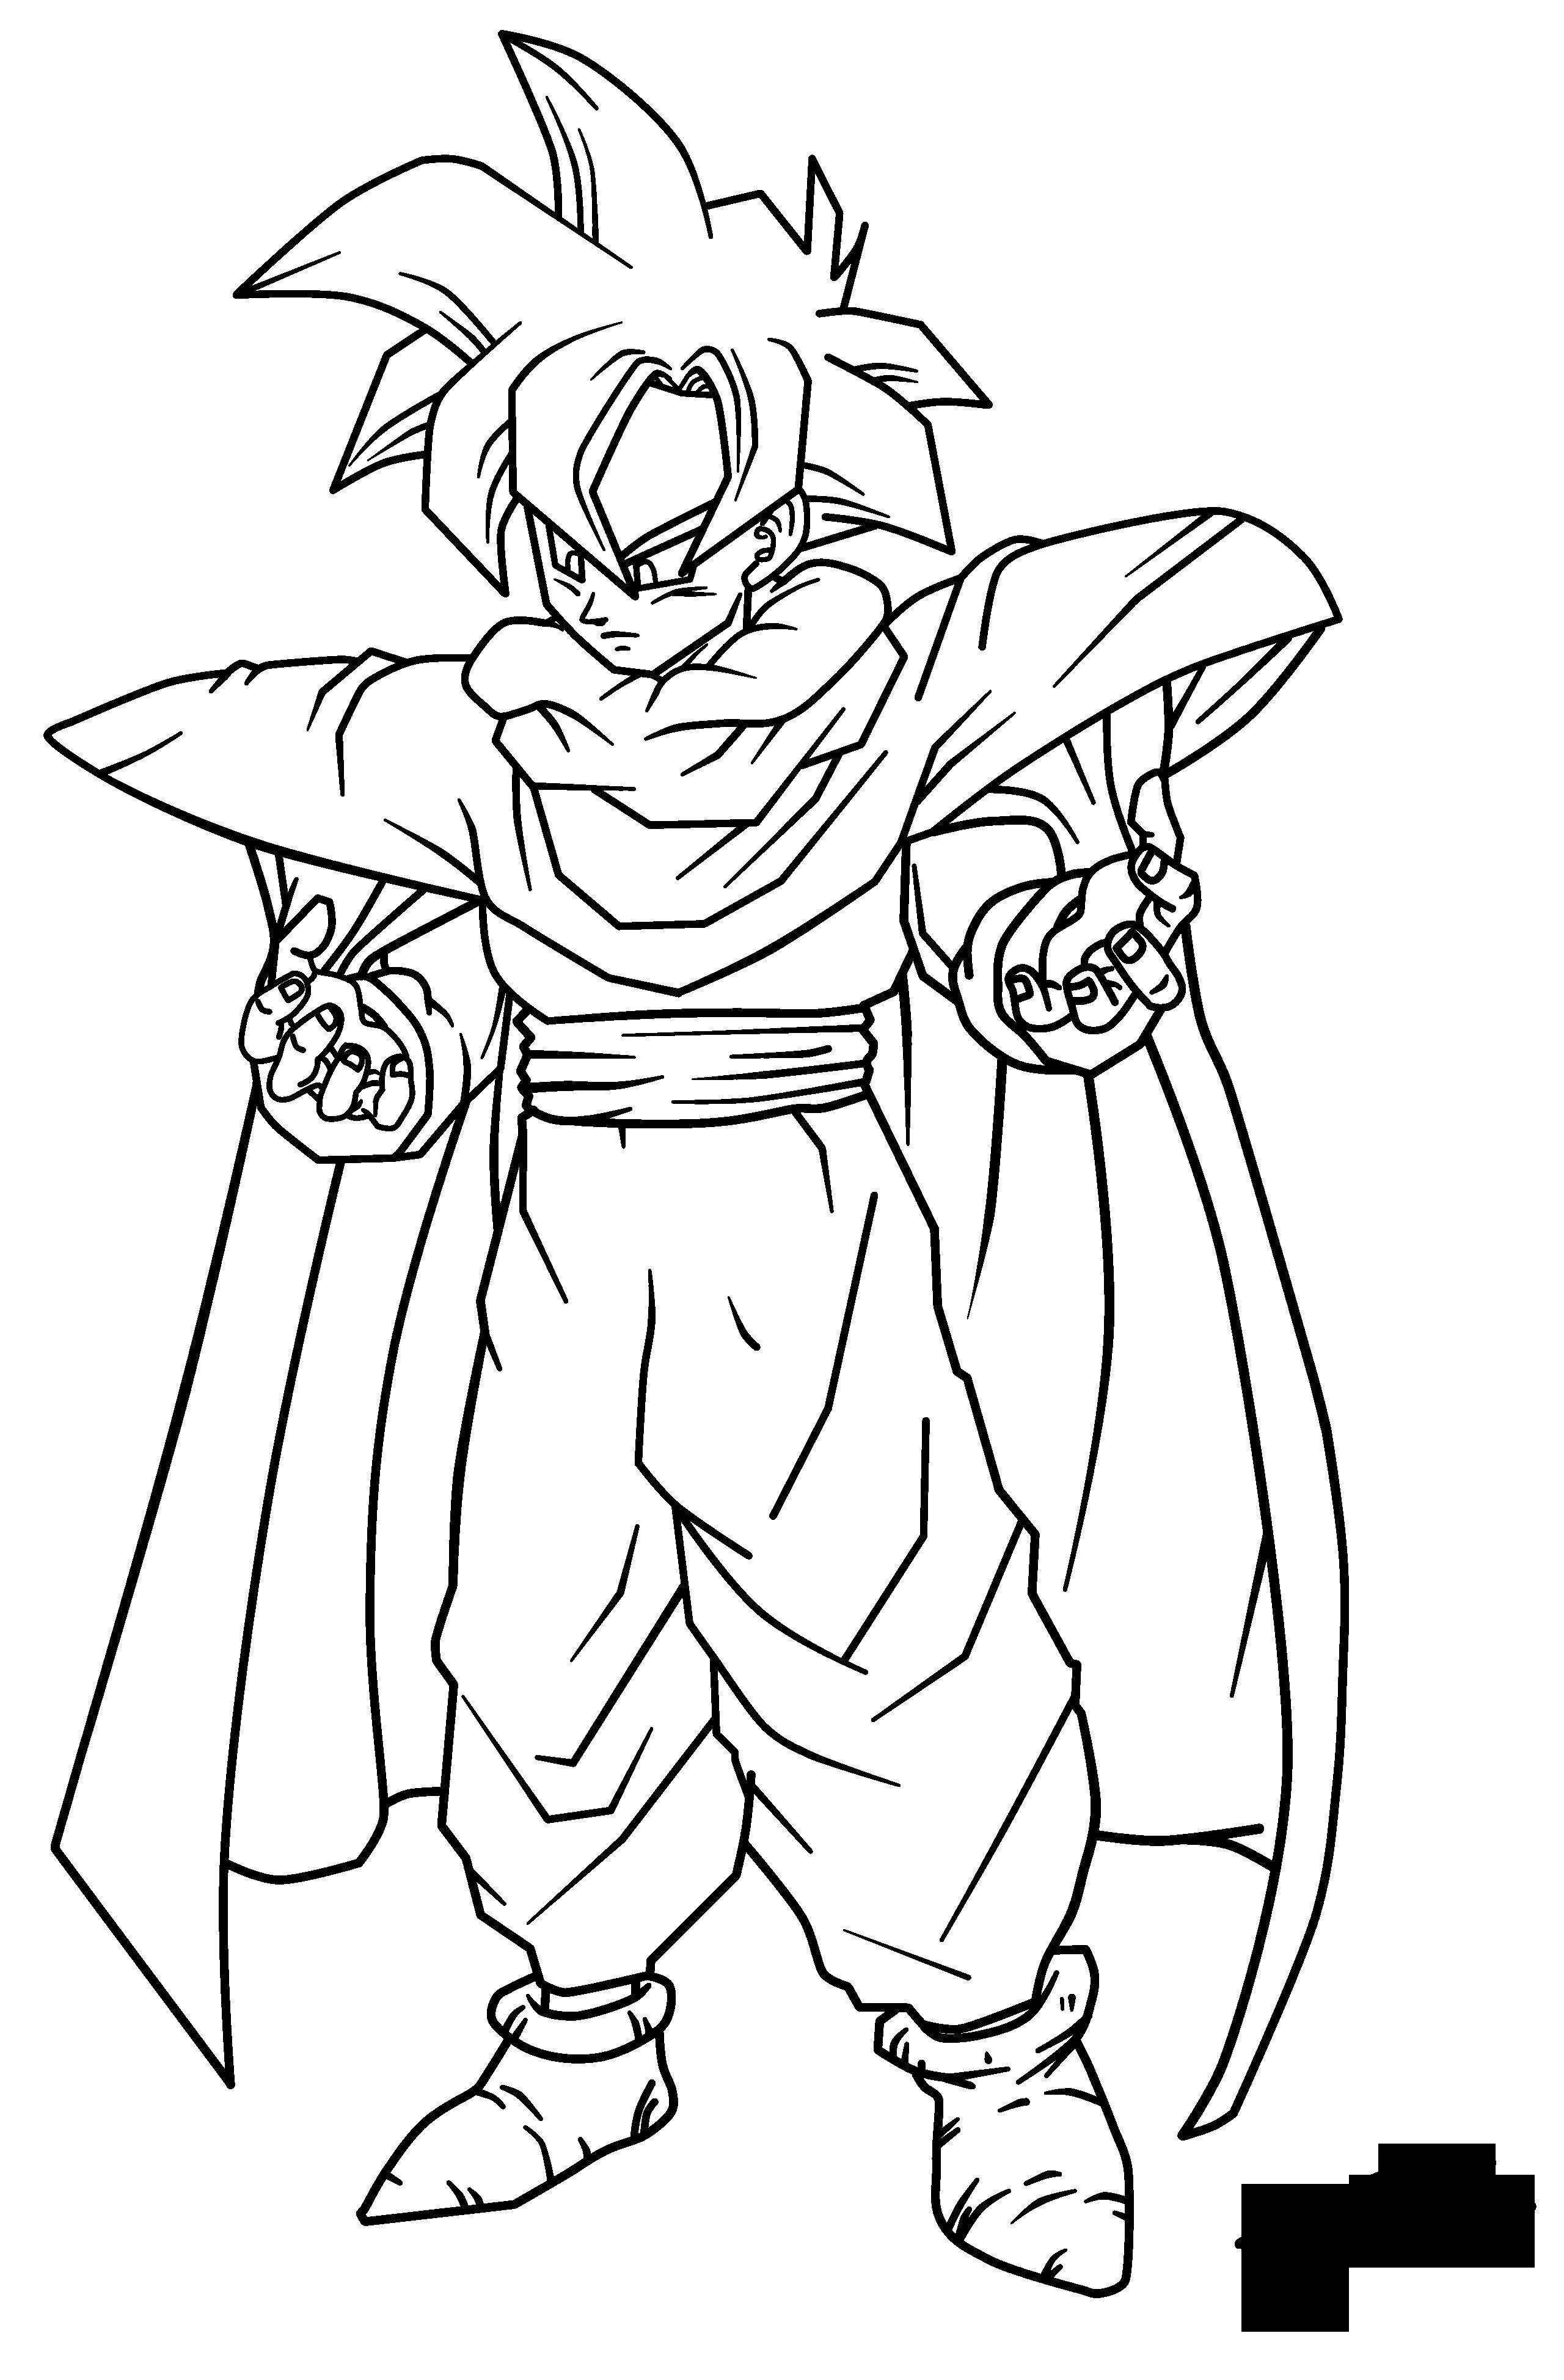 Gohan traje Piccolo Lineart + Color - El Mundo de Dragon Ball